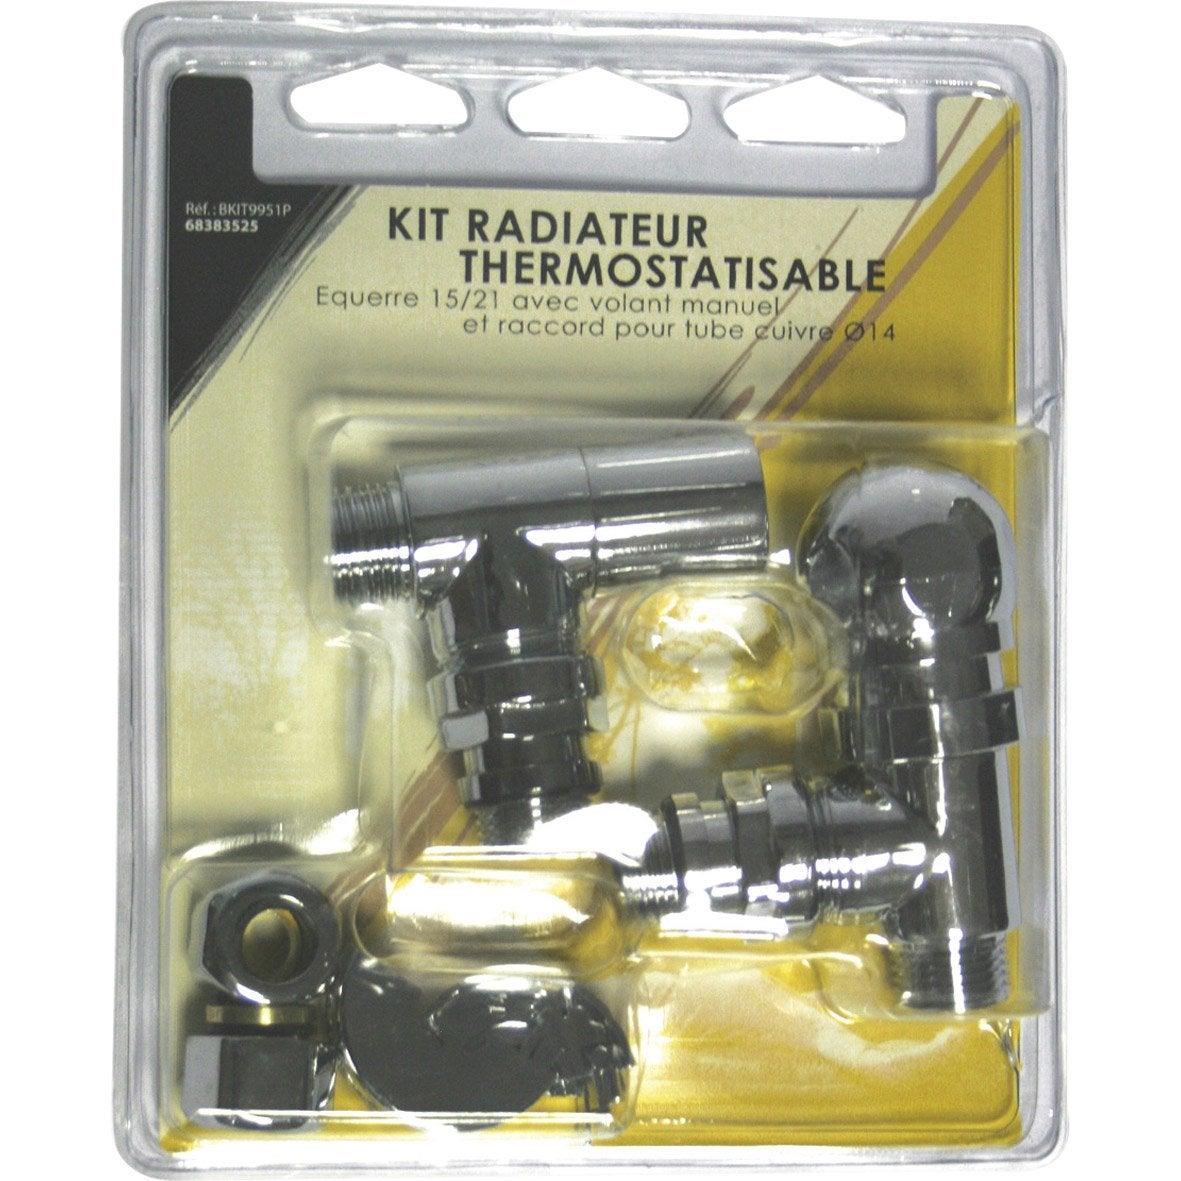 Kit Robinet Thermostatique Equerre 15 22 Male Femelle Laiton Chrome Ecopro